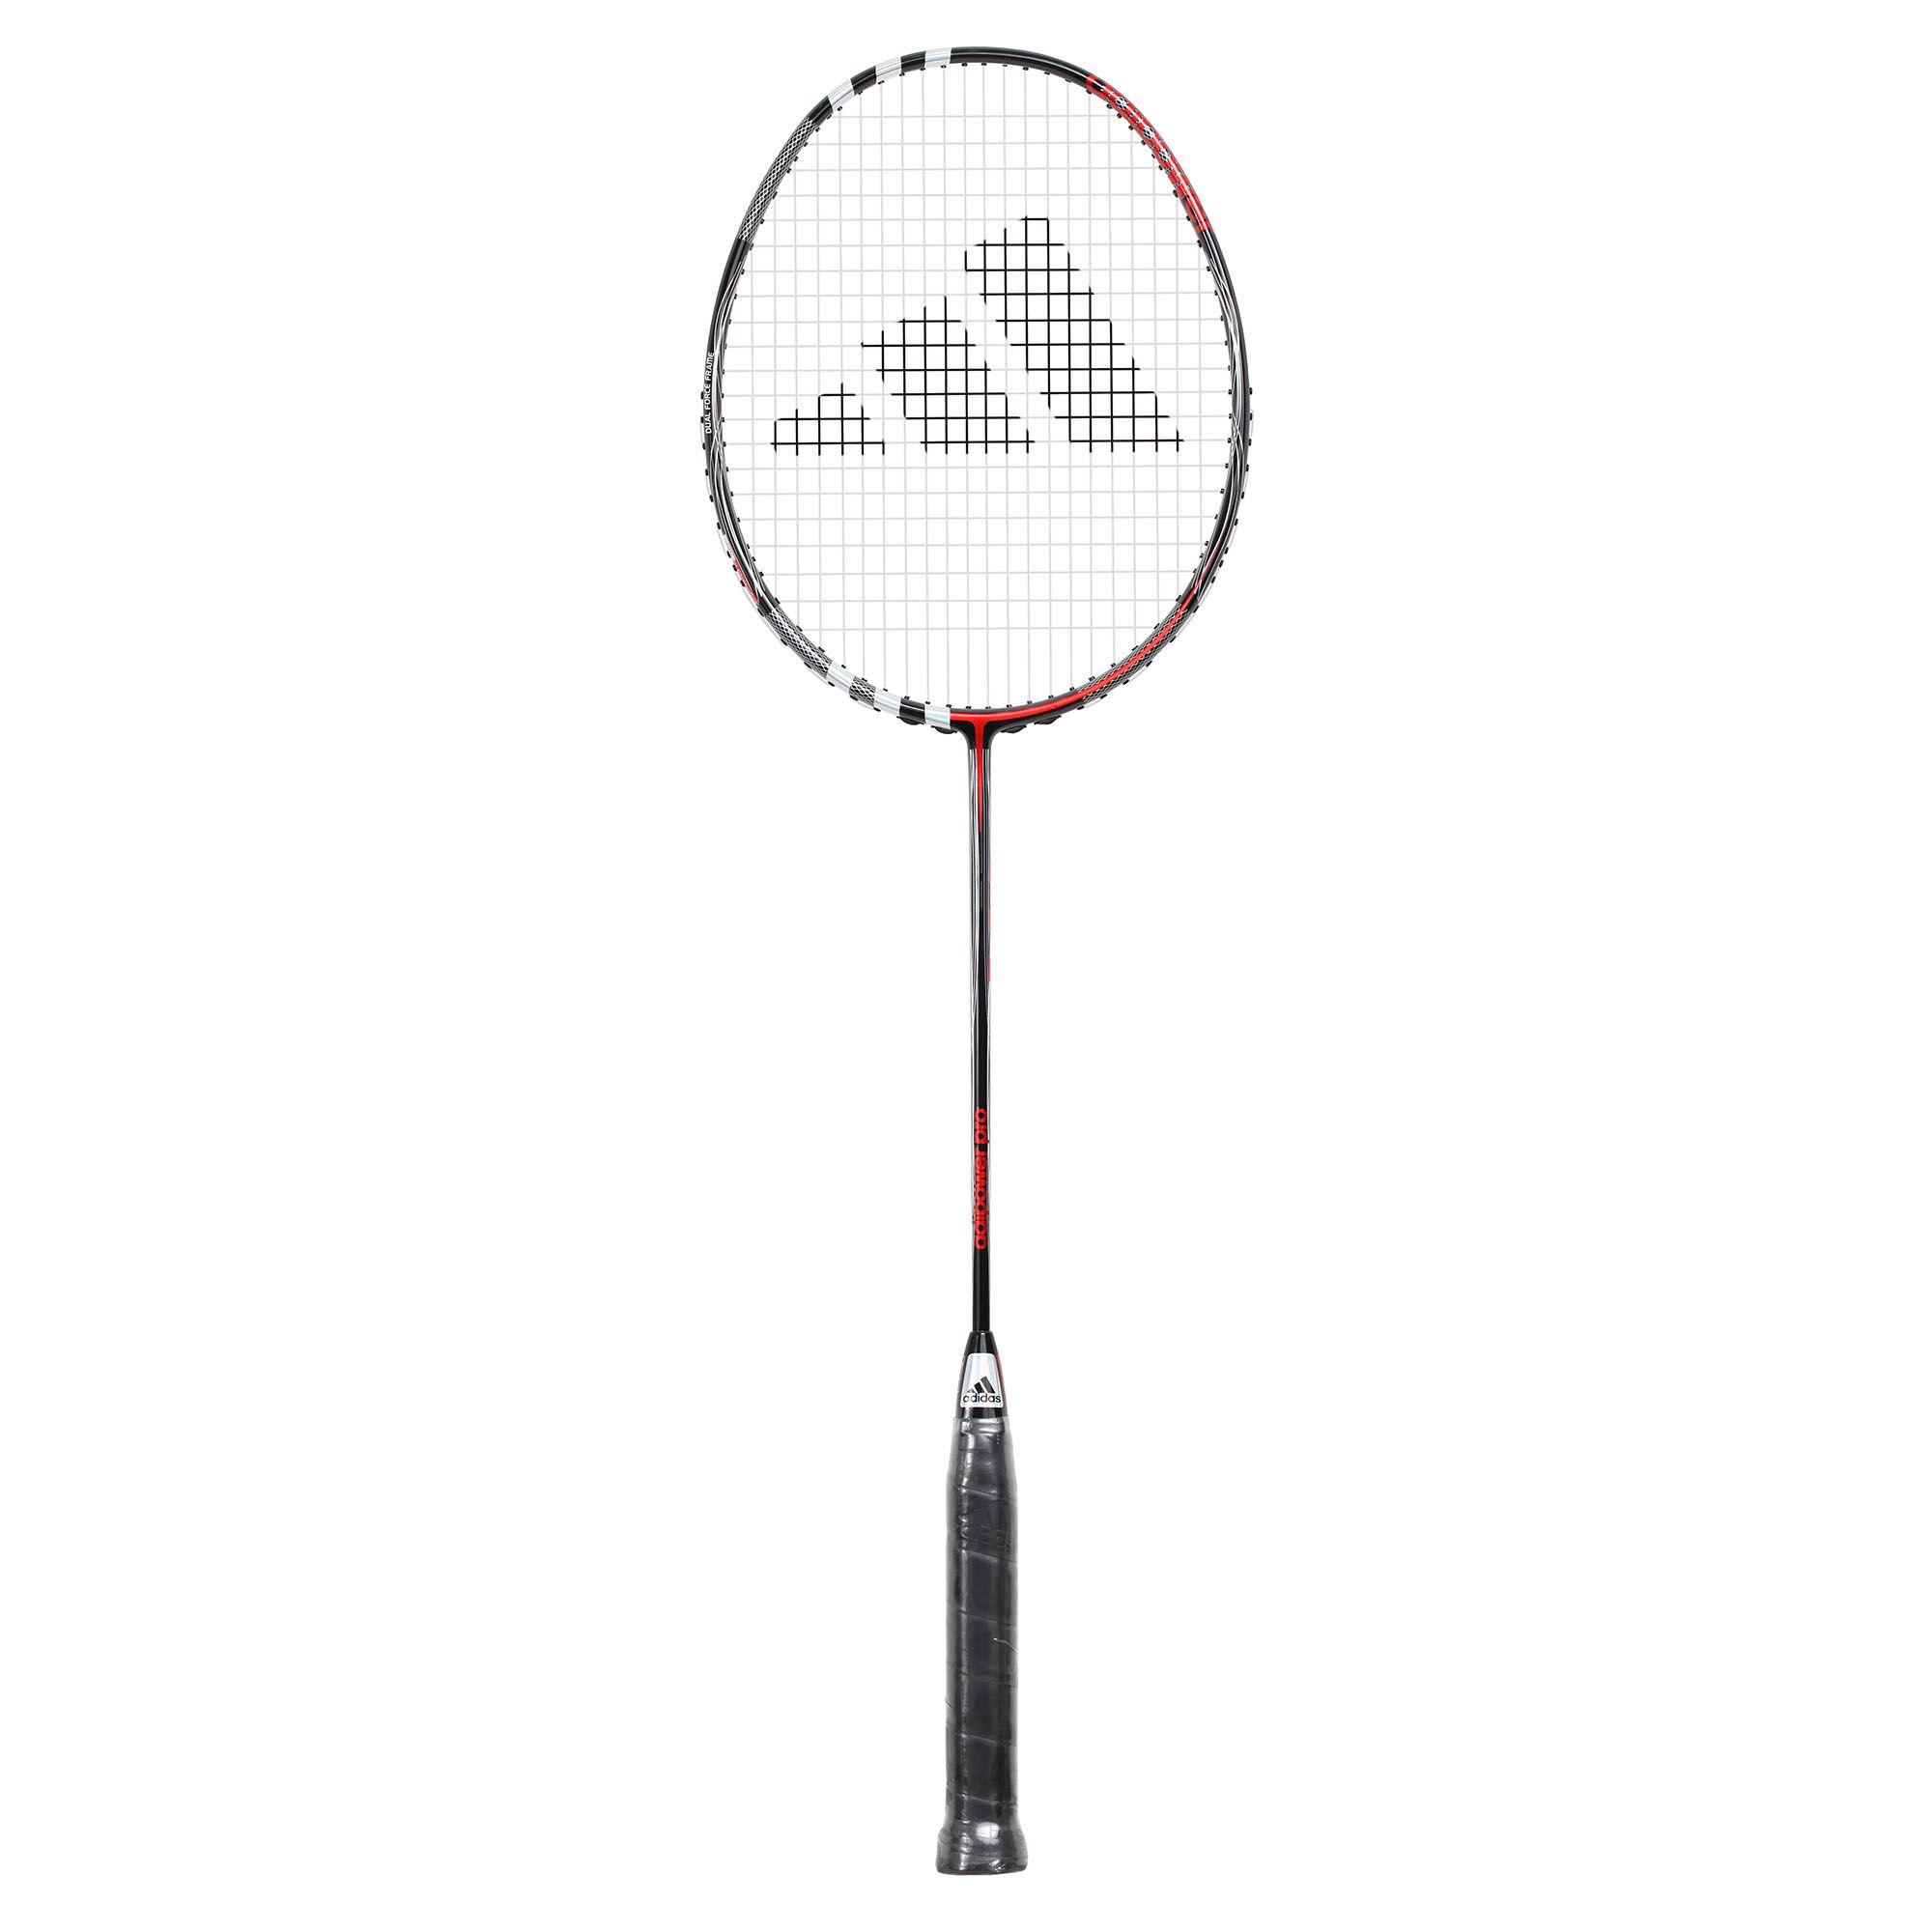 adidas Adipower Pro Badminton Racket - Sweatband.com